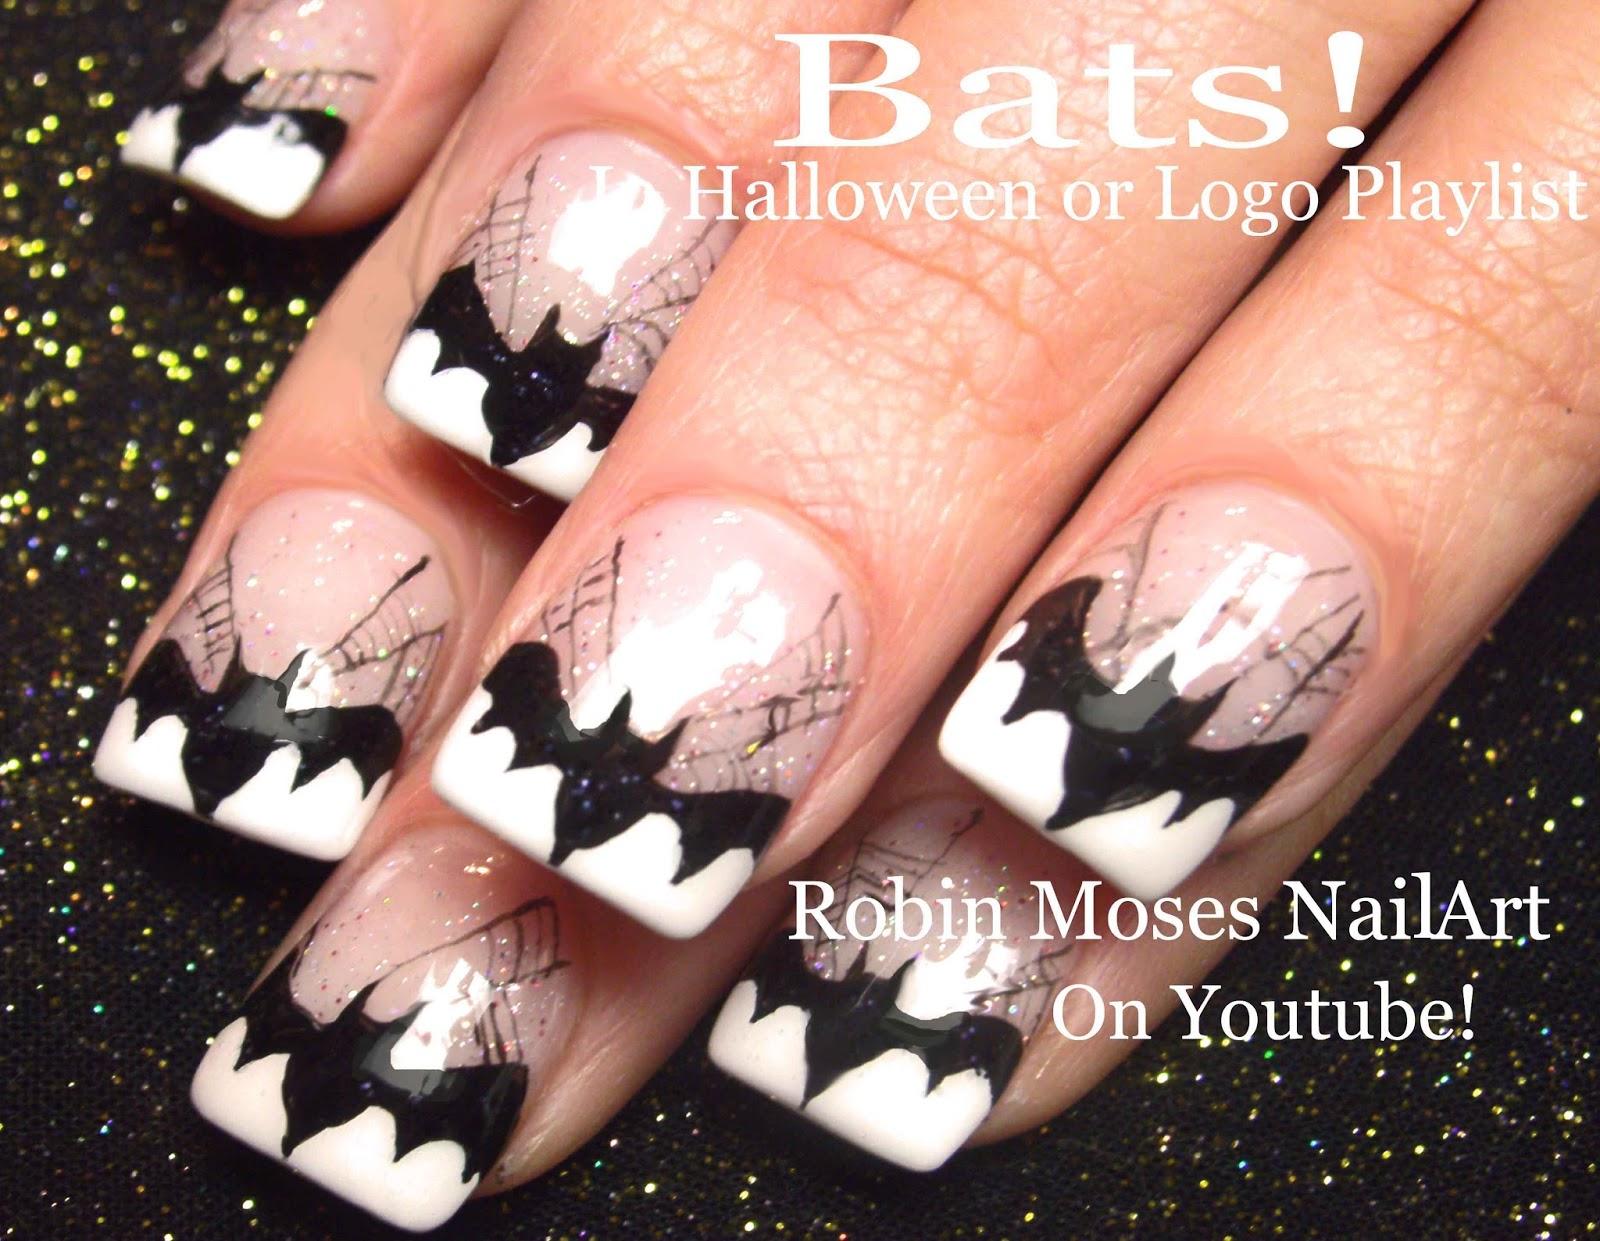 Robin moses nail art halloween nails halloween nail art halloween nails halloween nail art blood splatter nails bloody nails scary nails halloween nail art bloody nail art halloween ideas prinsesfo Gallery